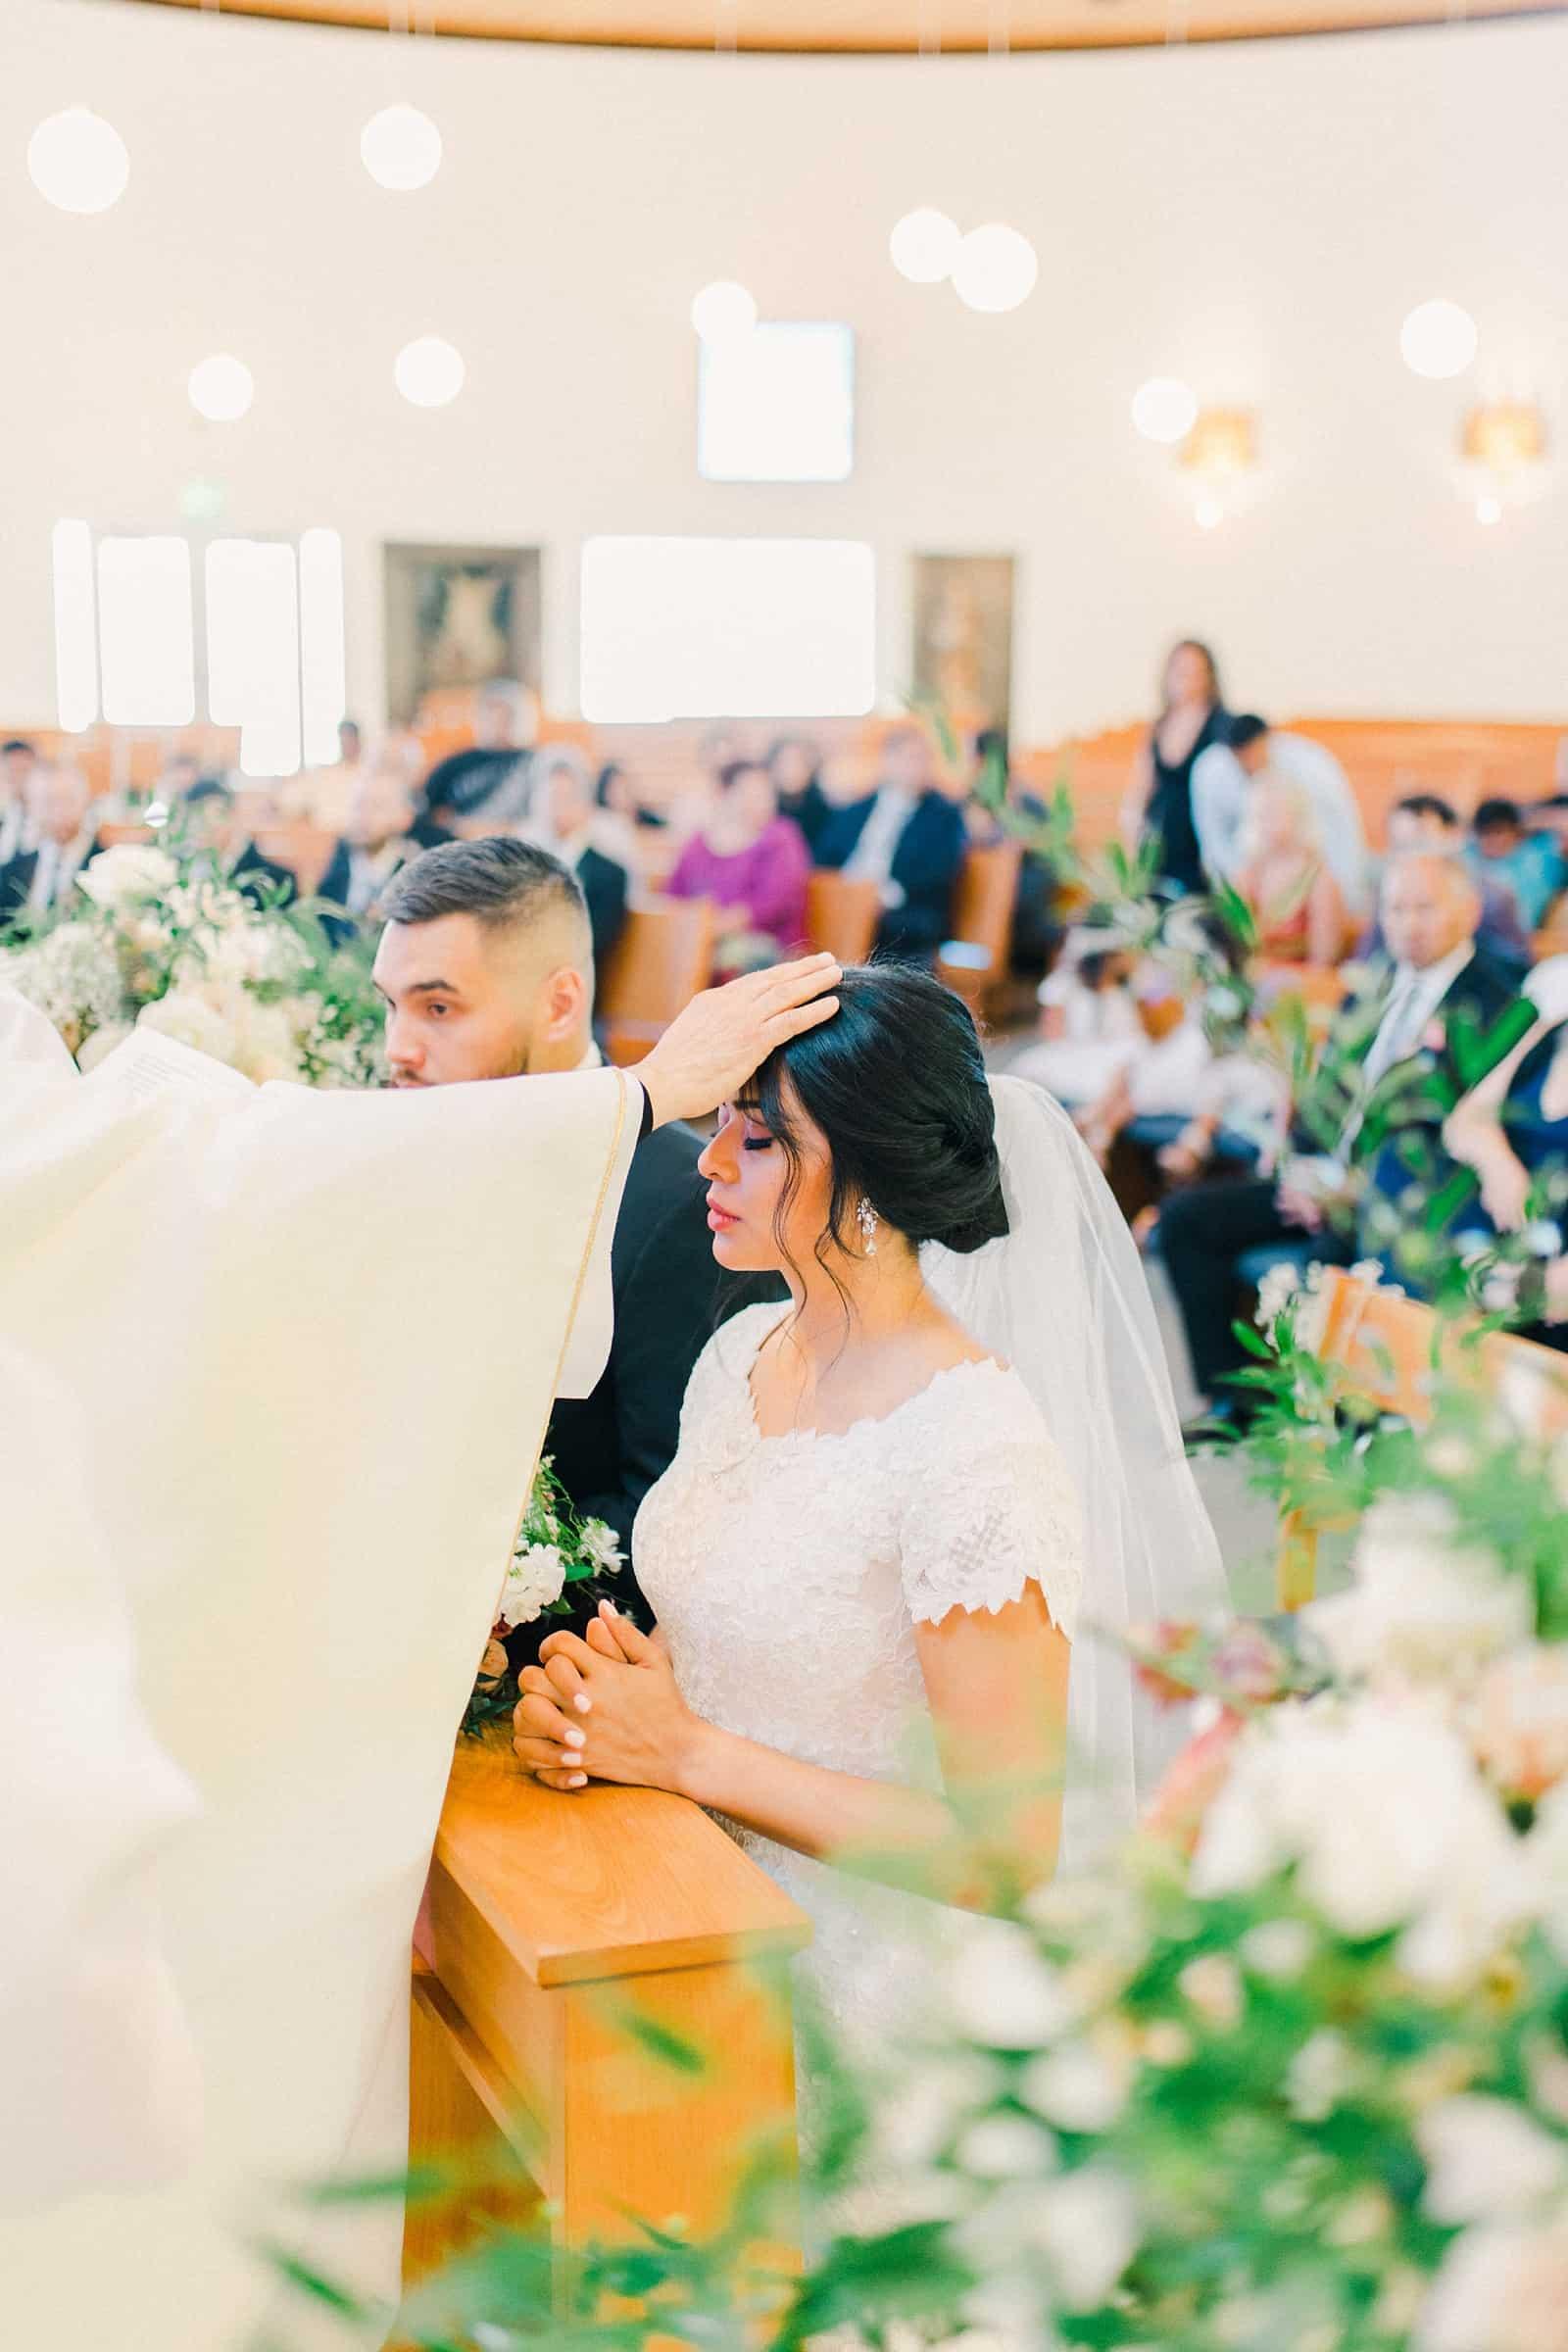 Bride with priest pray during catholic wedding ceremony